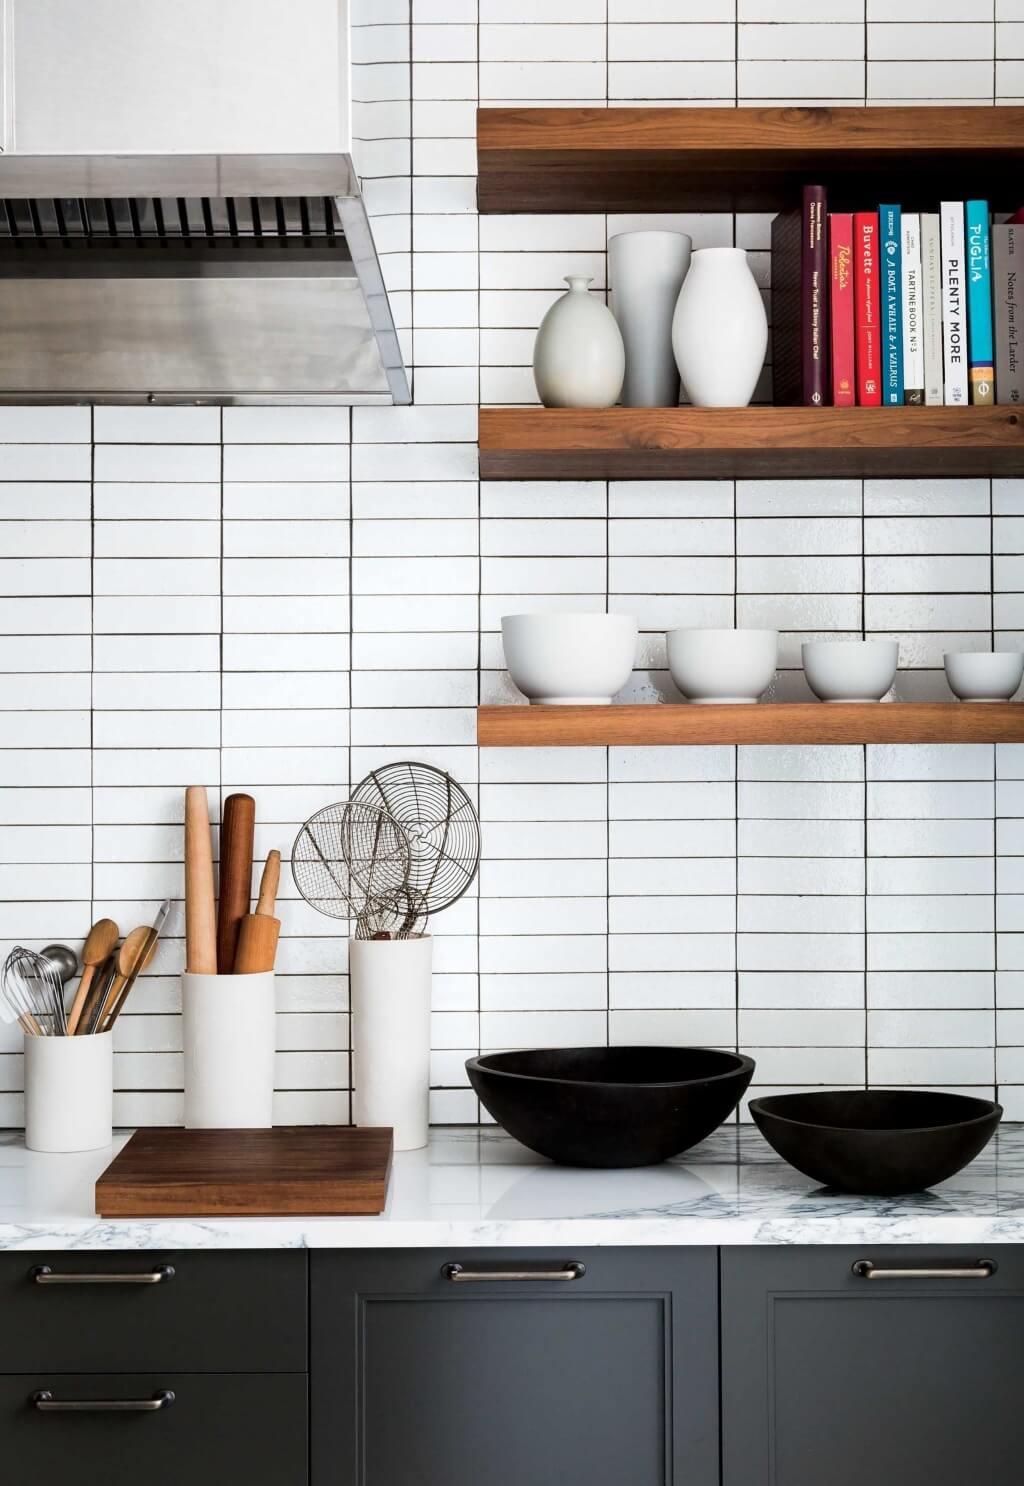 Black and white bathroom tile kitchen back wall